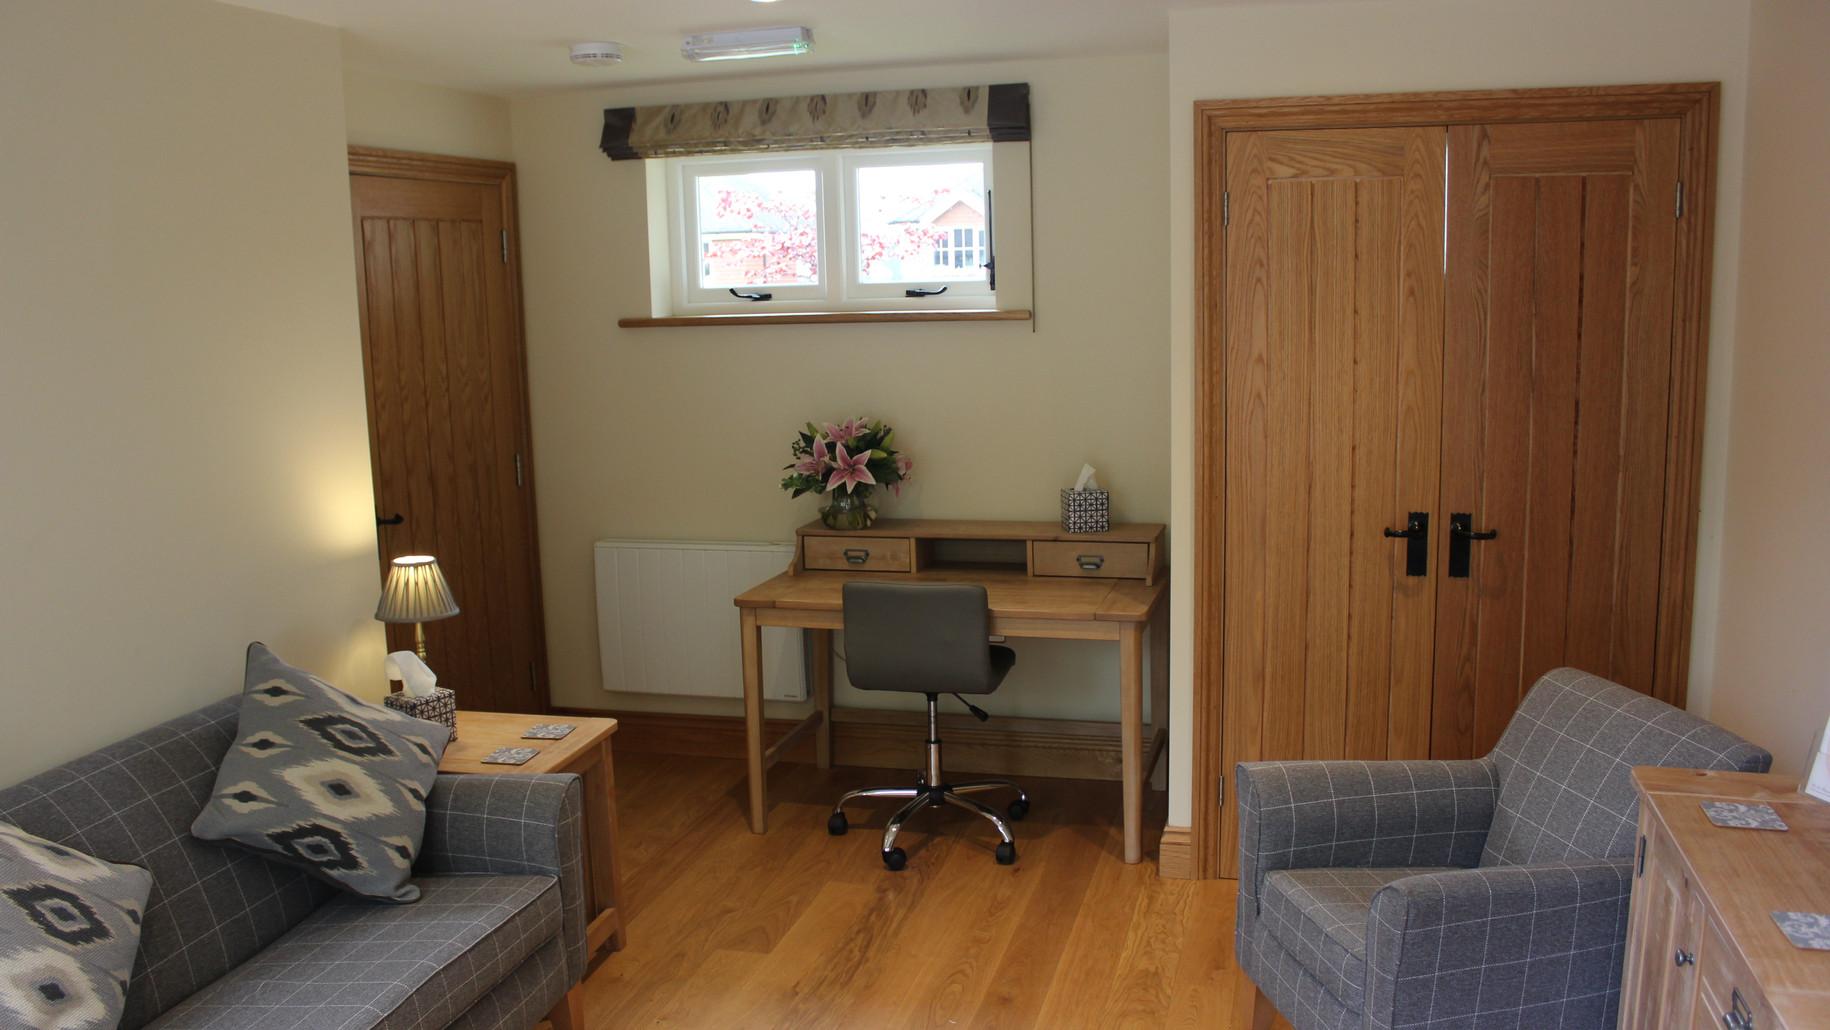 Brooks-meeting-room-with-desk.JPG